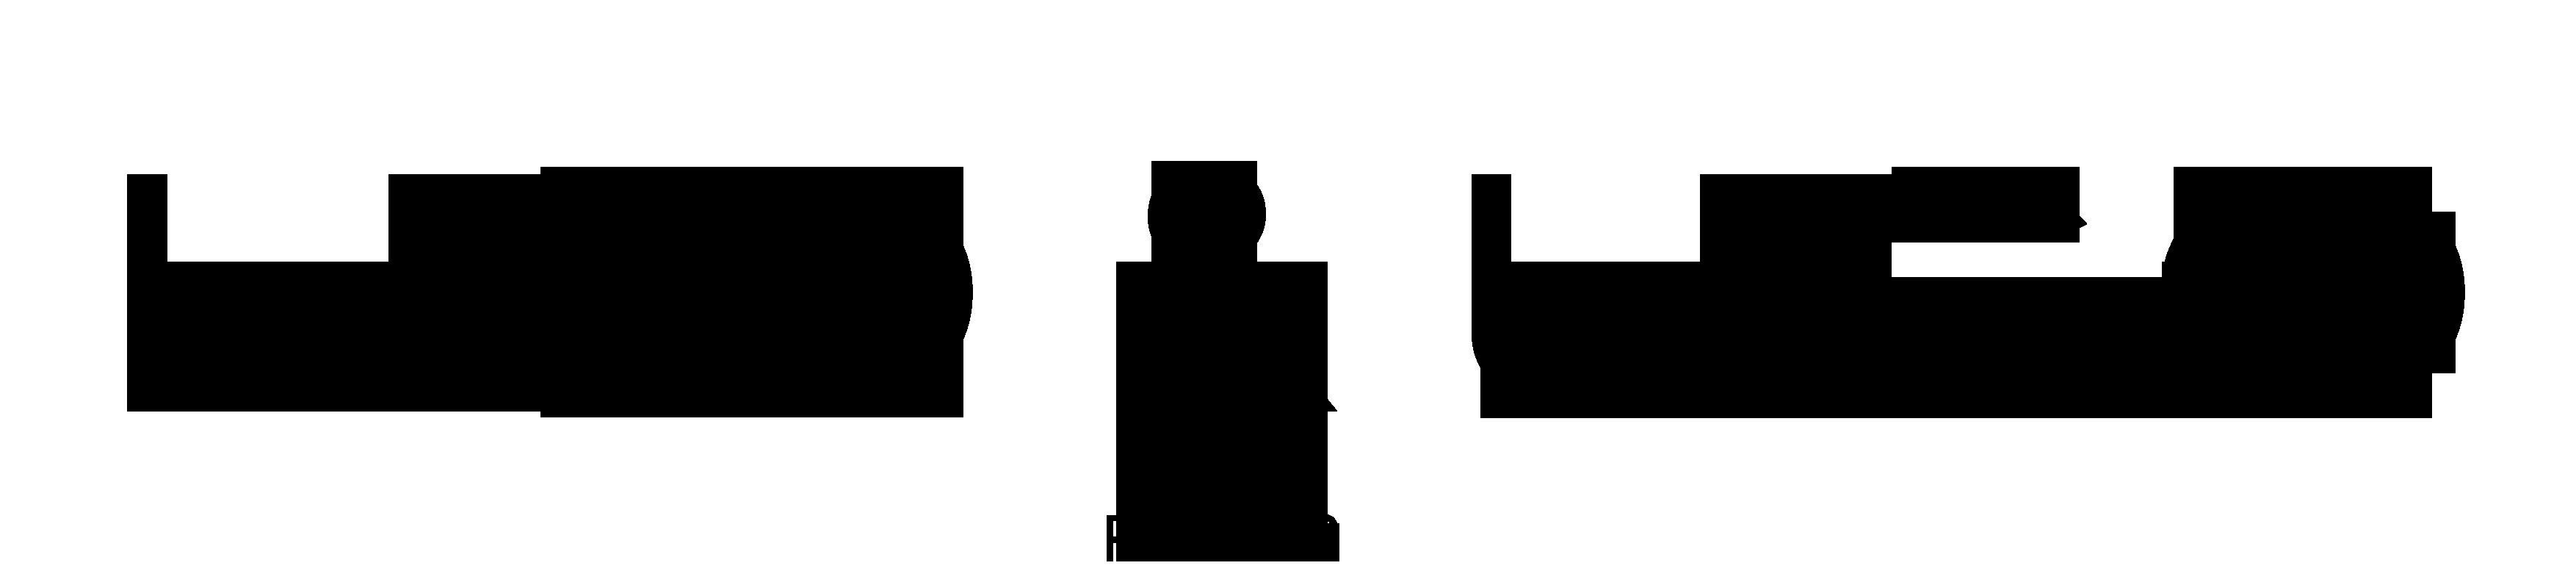 https://bbt.org.ua/wp-content/uploads/2020/07/leohugo-logo.png